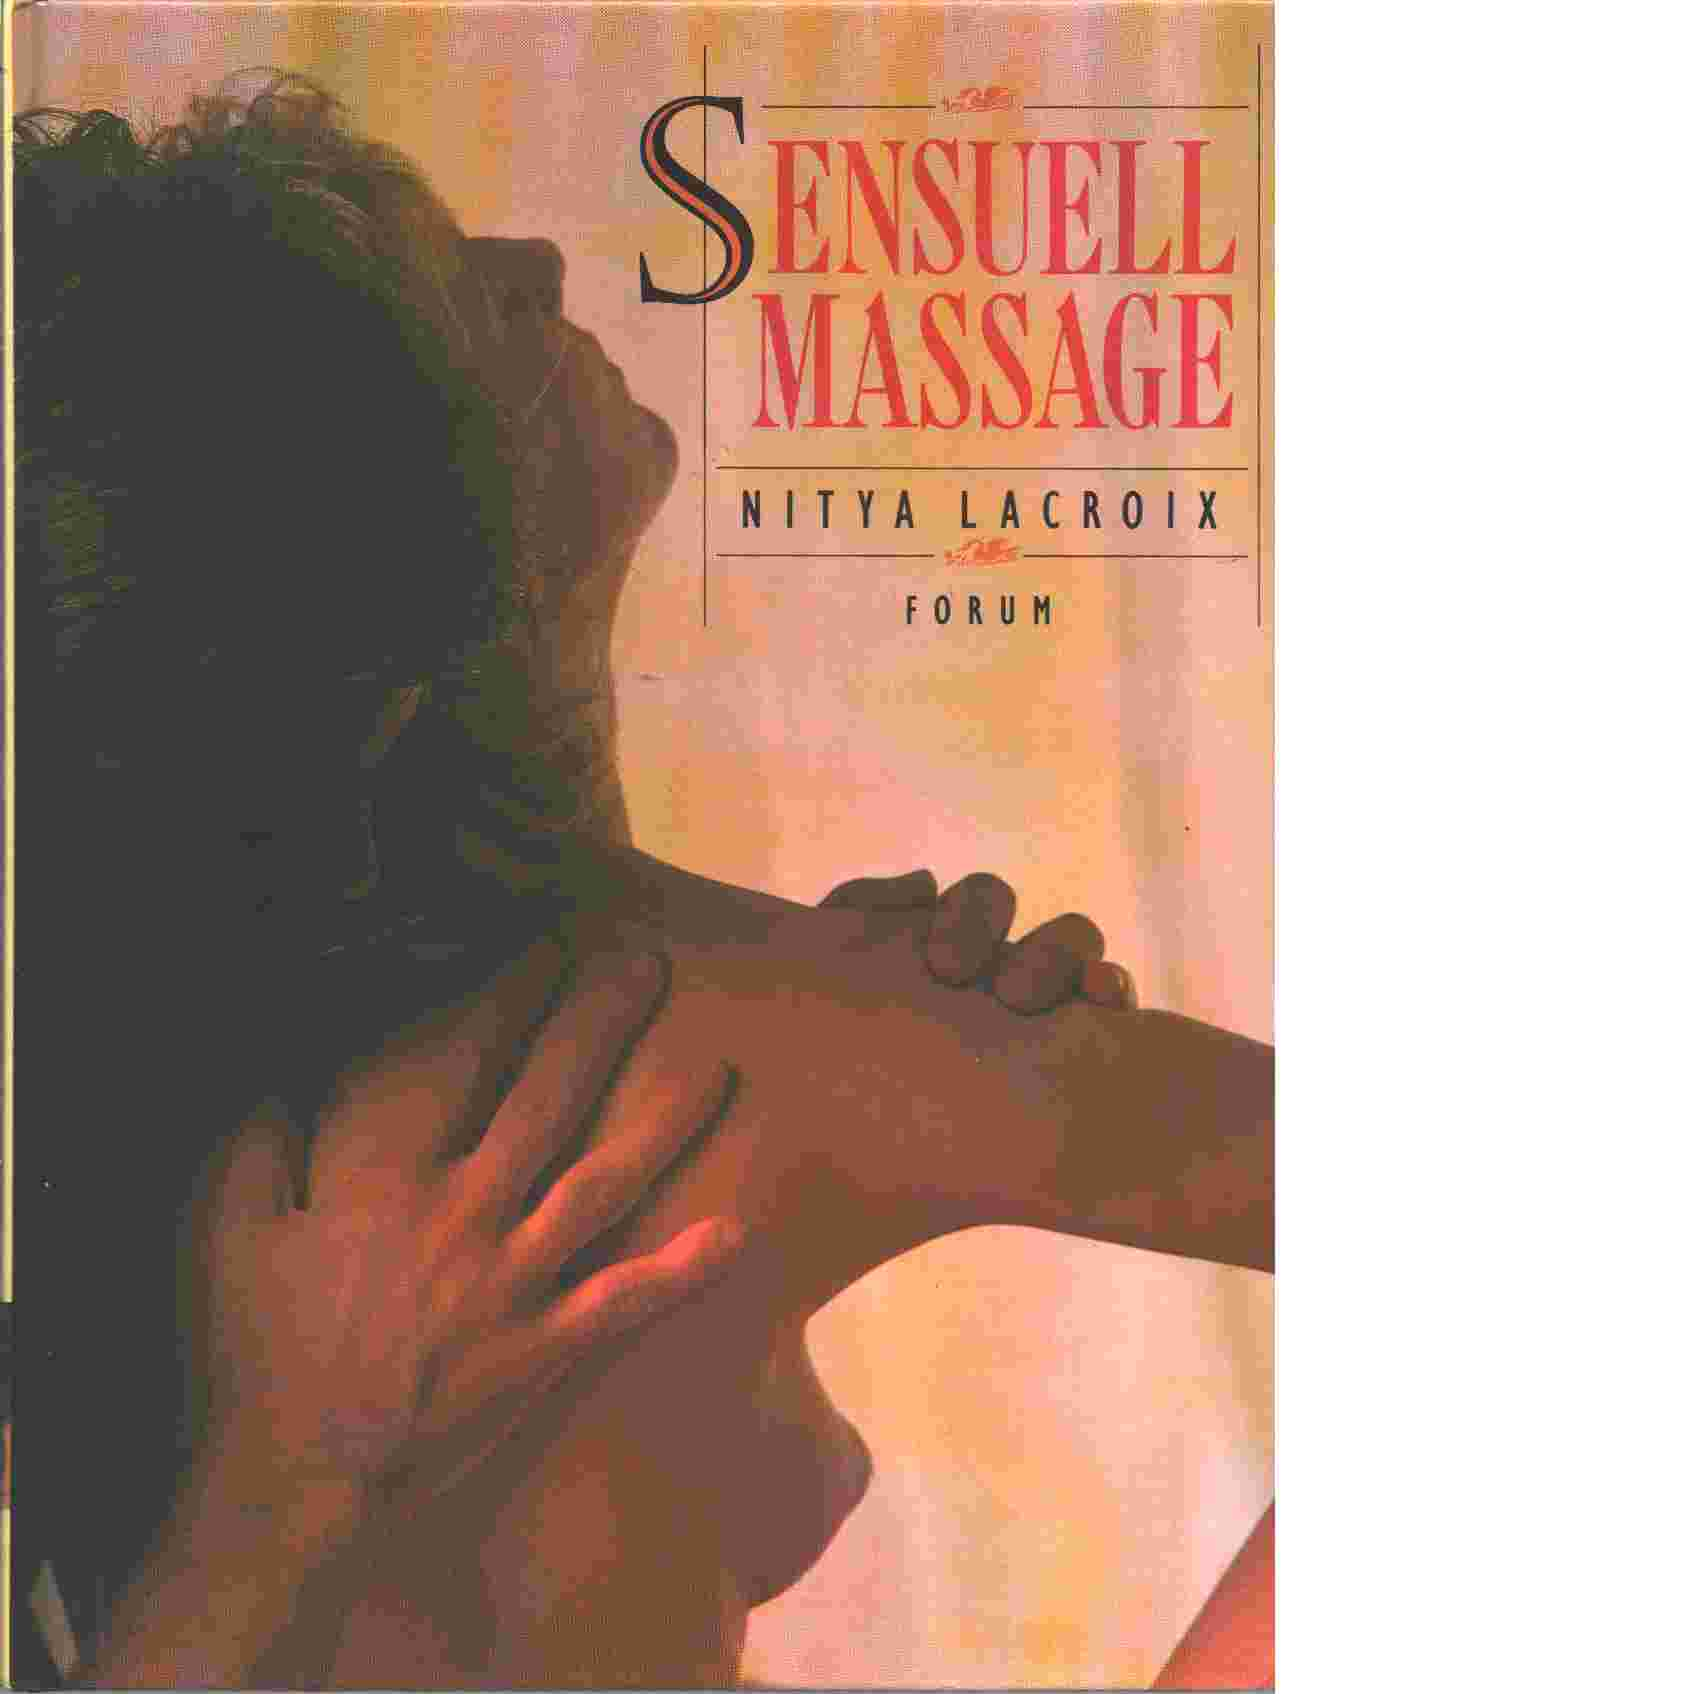 stockholm massage happy ending sensuell massage sthlm homo